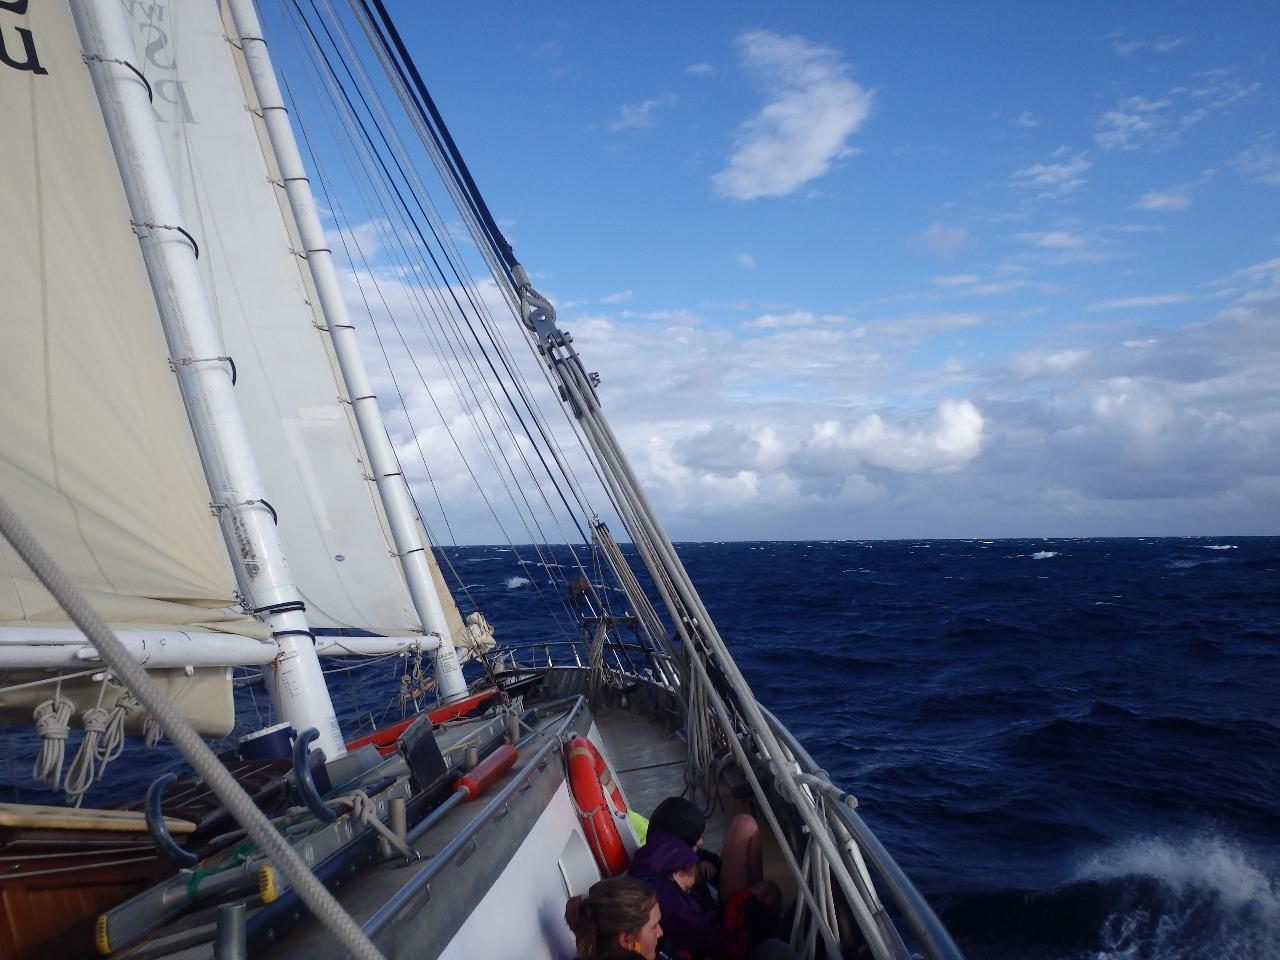 Youth 8-day Voyage - Sydney to Brisbane 6-13 January 2022